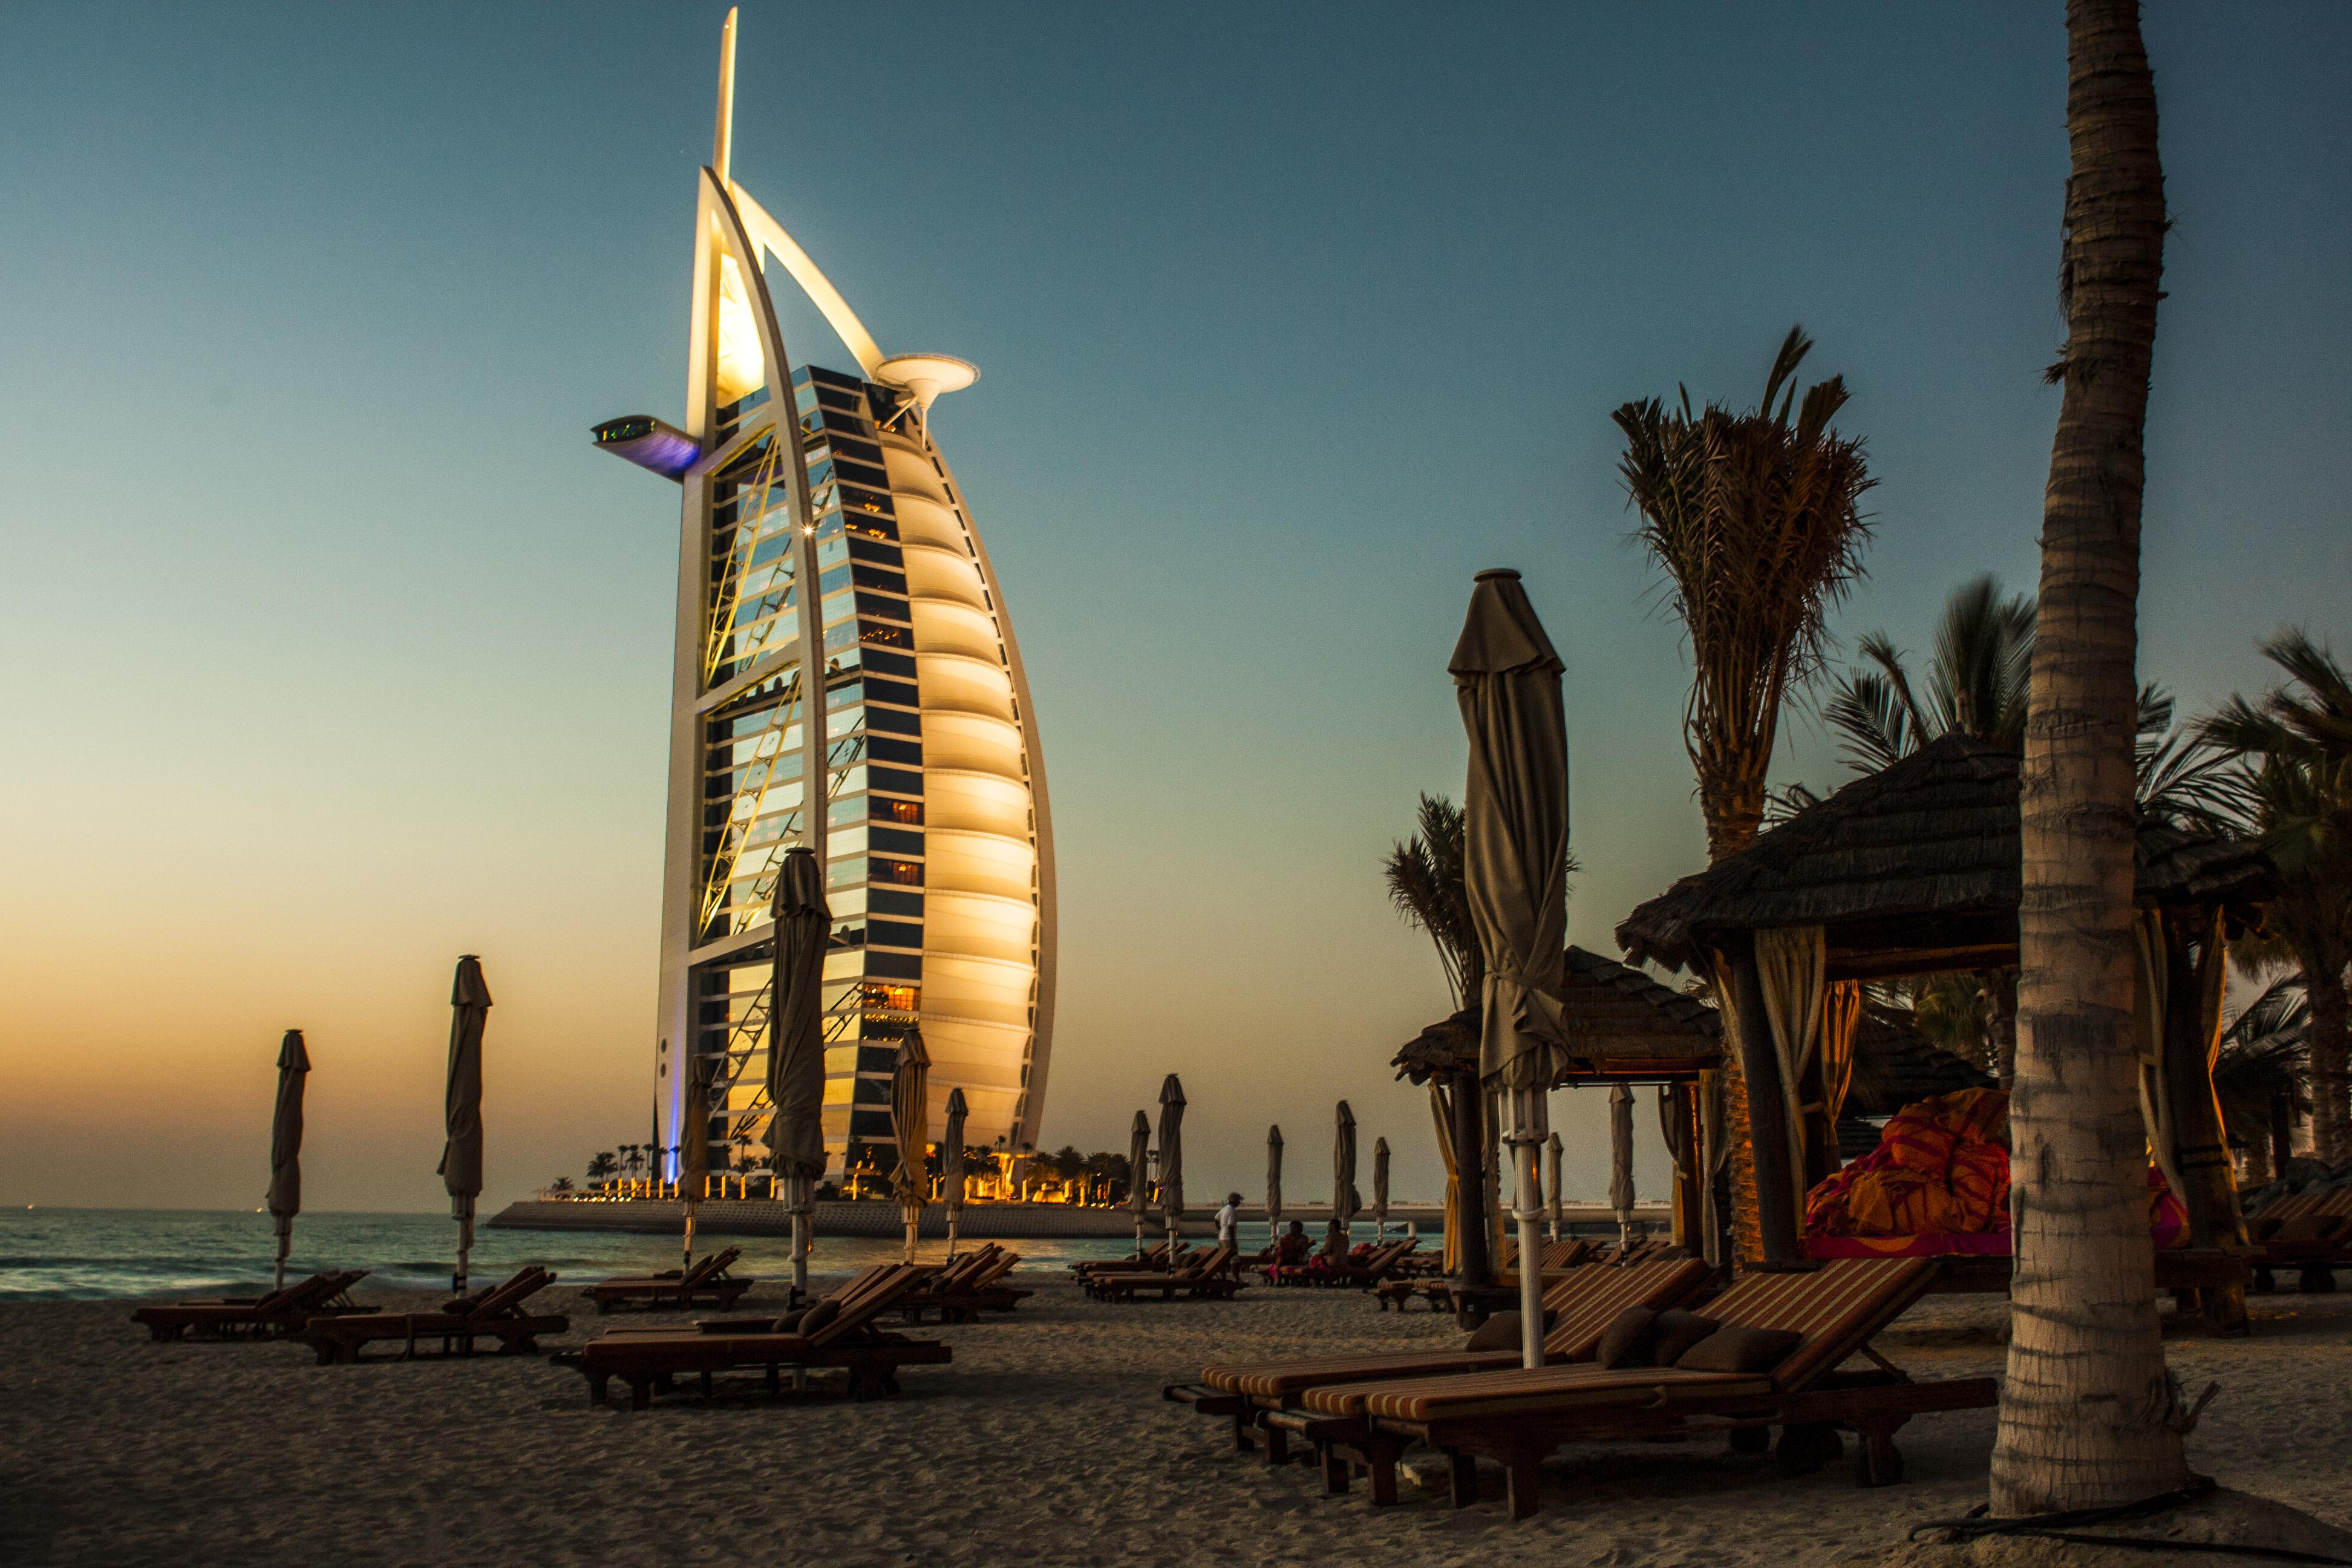 Beach Architecture Sunset Night Skyser Dusk Evening Tower Dubai Landmark Palmtree Publicdomain Luxury Hotel Resort Burjalarab